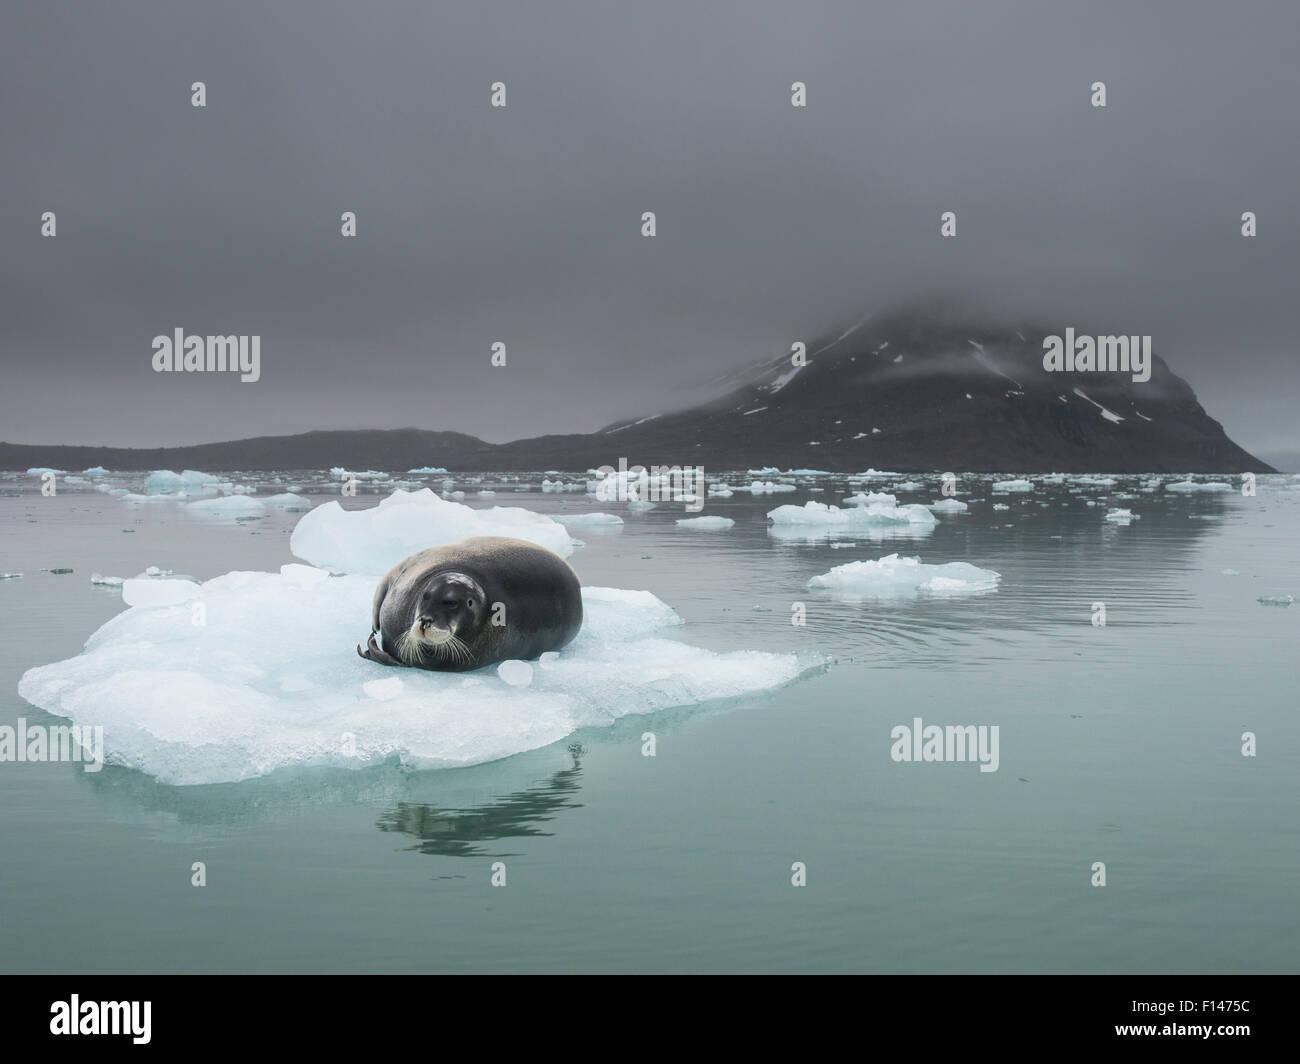 Bearded seal (Erignathus barbatus) resting on ice floe, Spitsbergen, Svalbard, Norway, July. - Stock Image